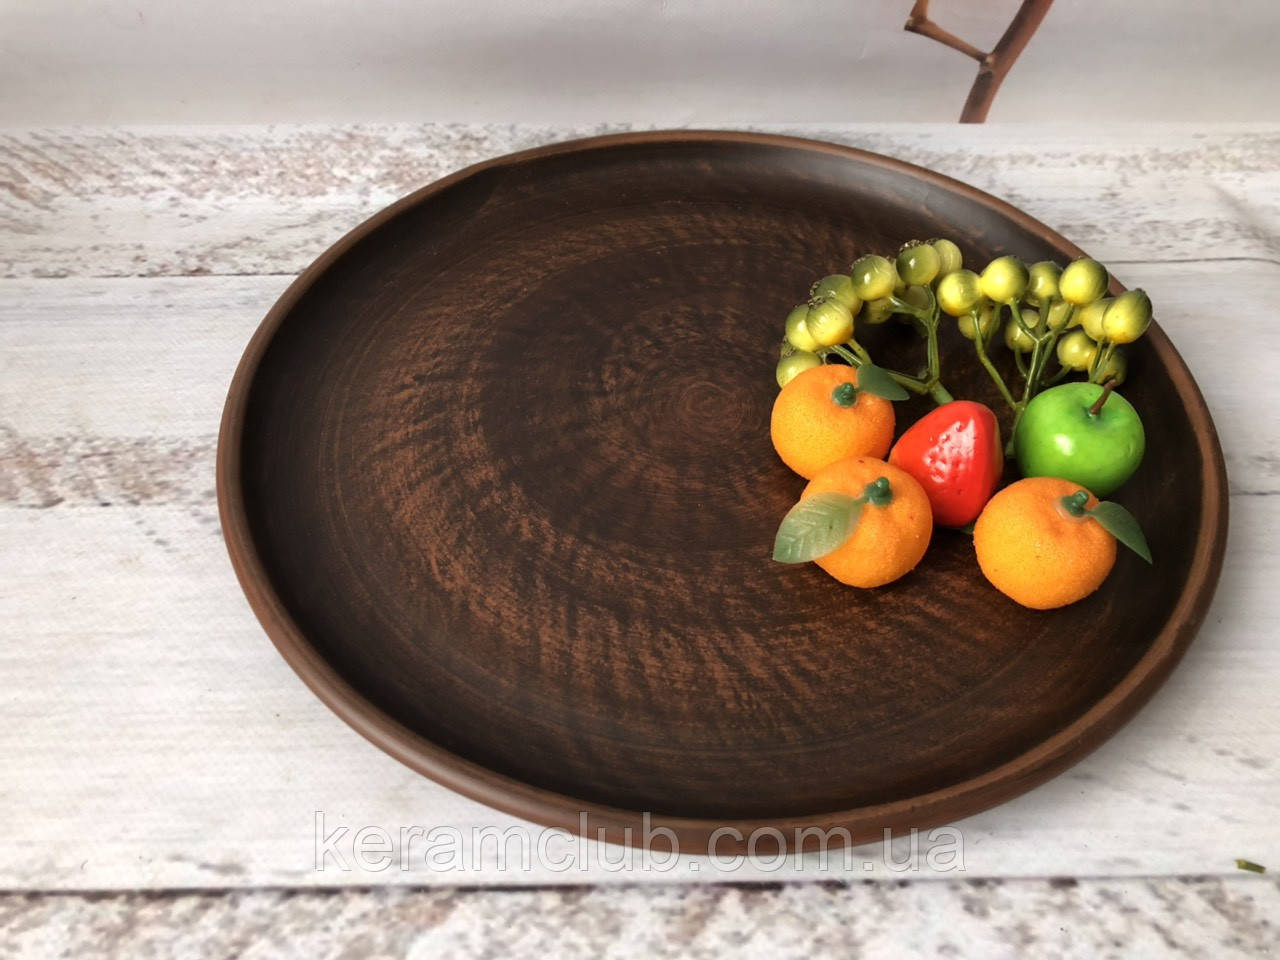 Глиняне блюдо Керамклуб 30см